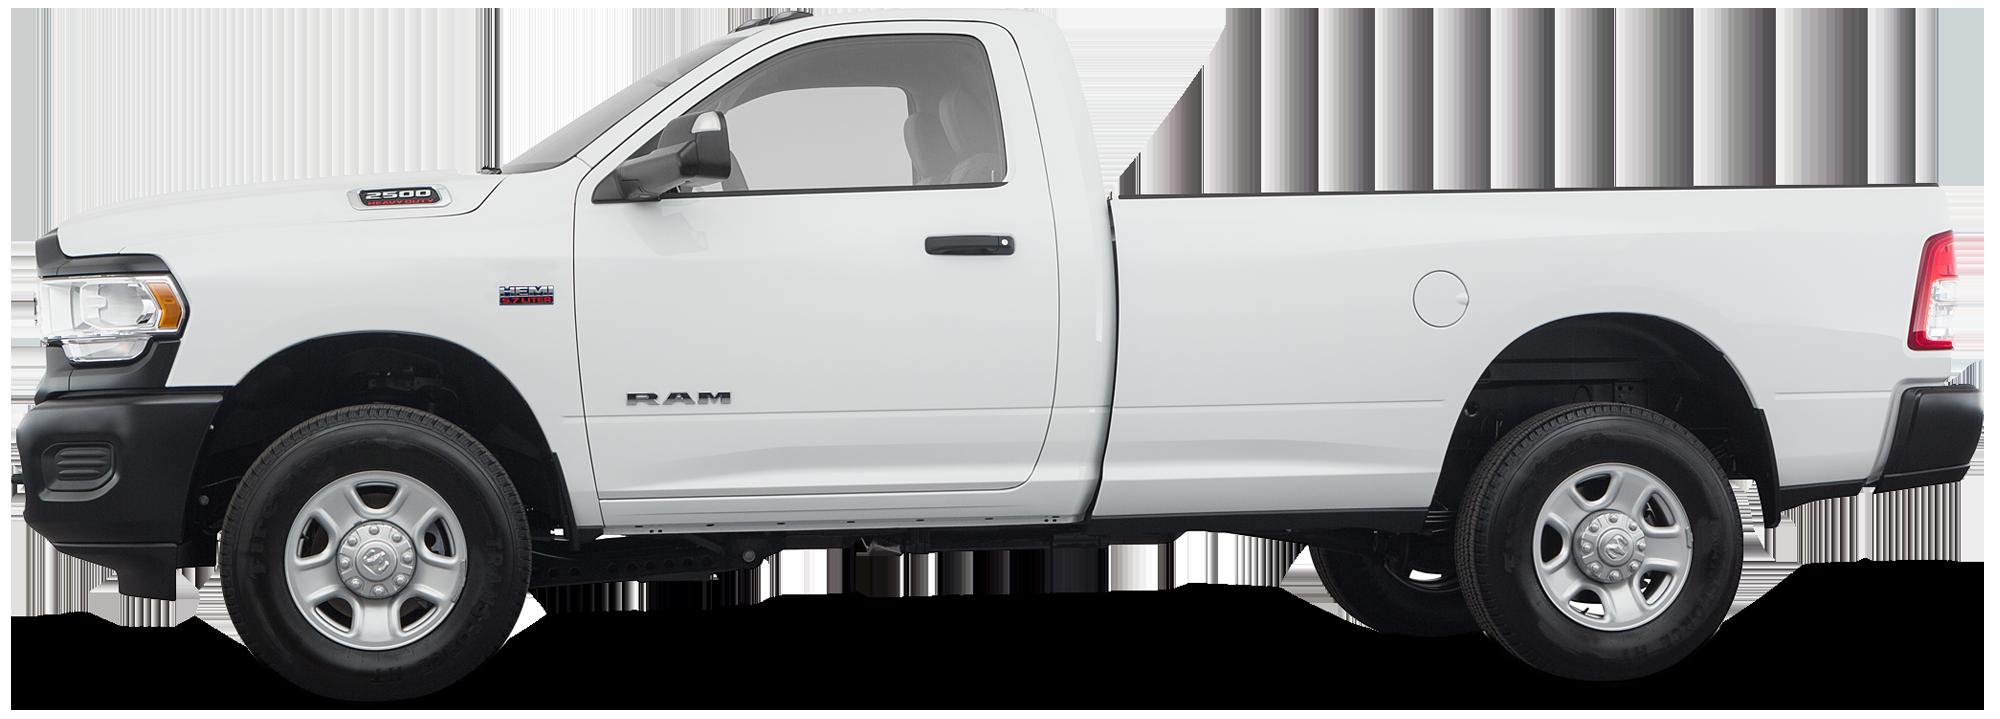 2022 Ram 2500 Truck Tradesman